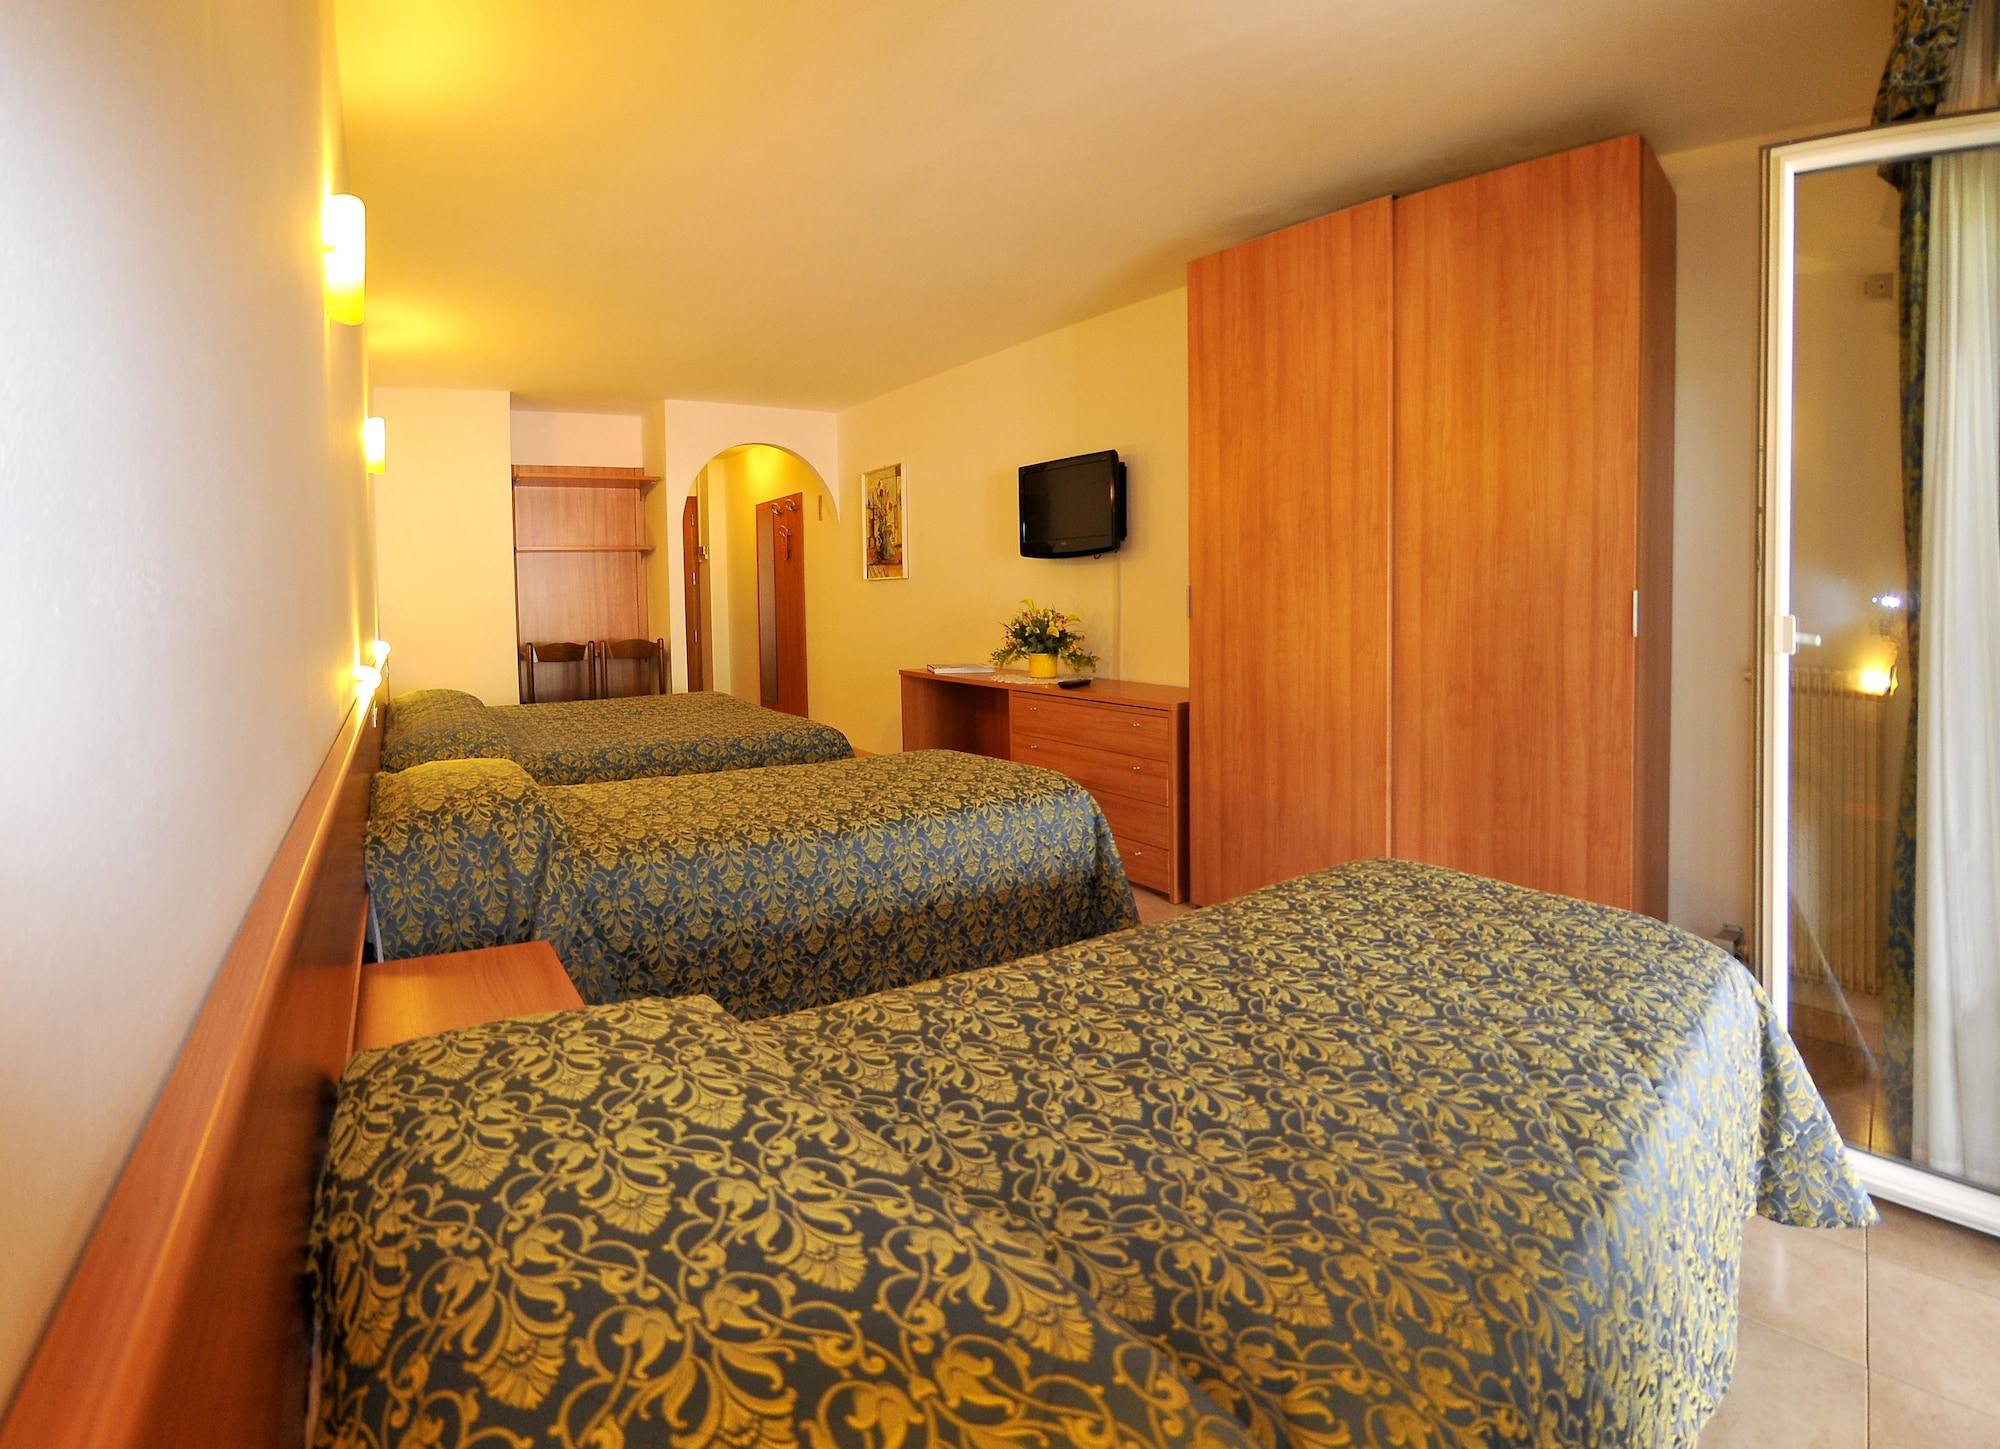 Hotel Alpen, Trento